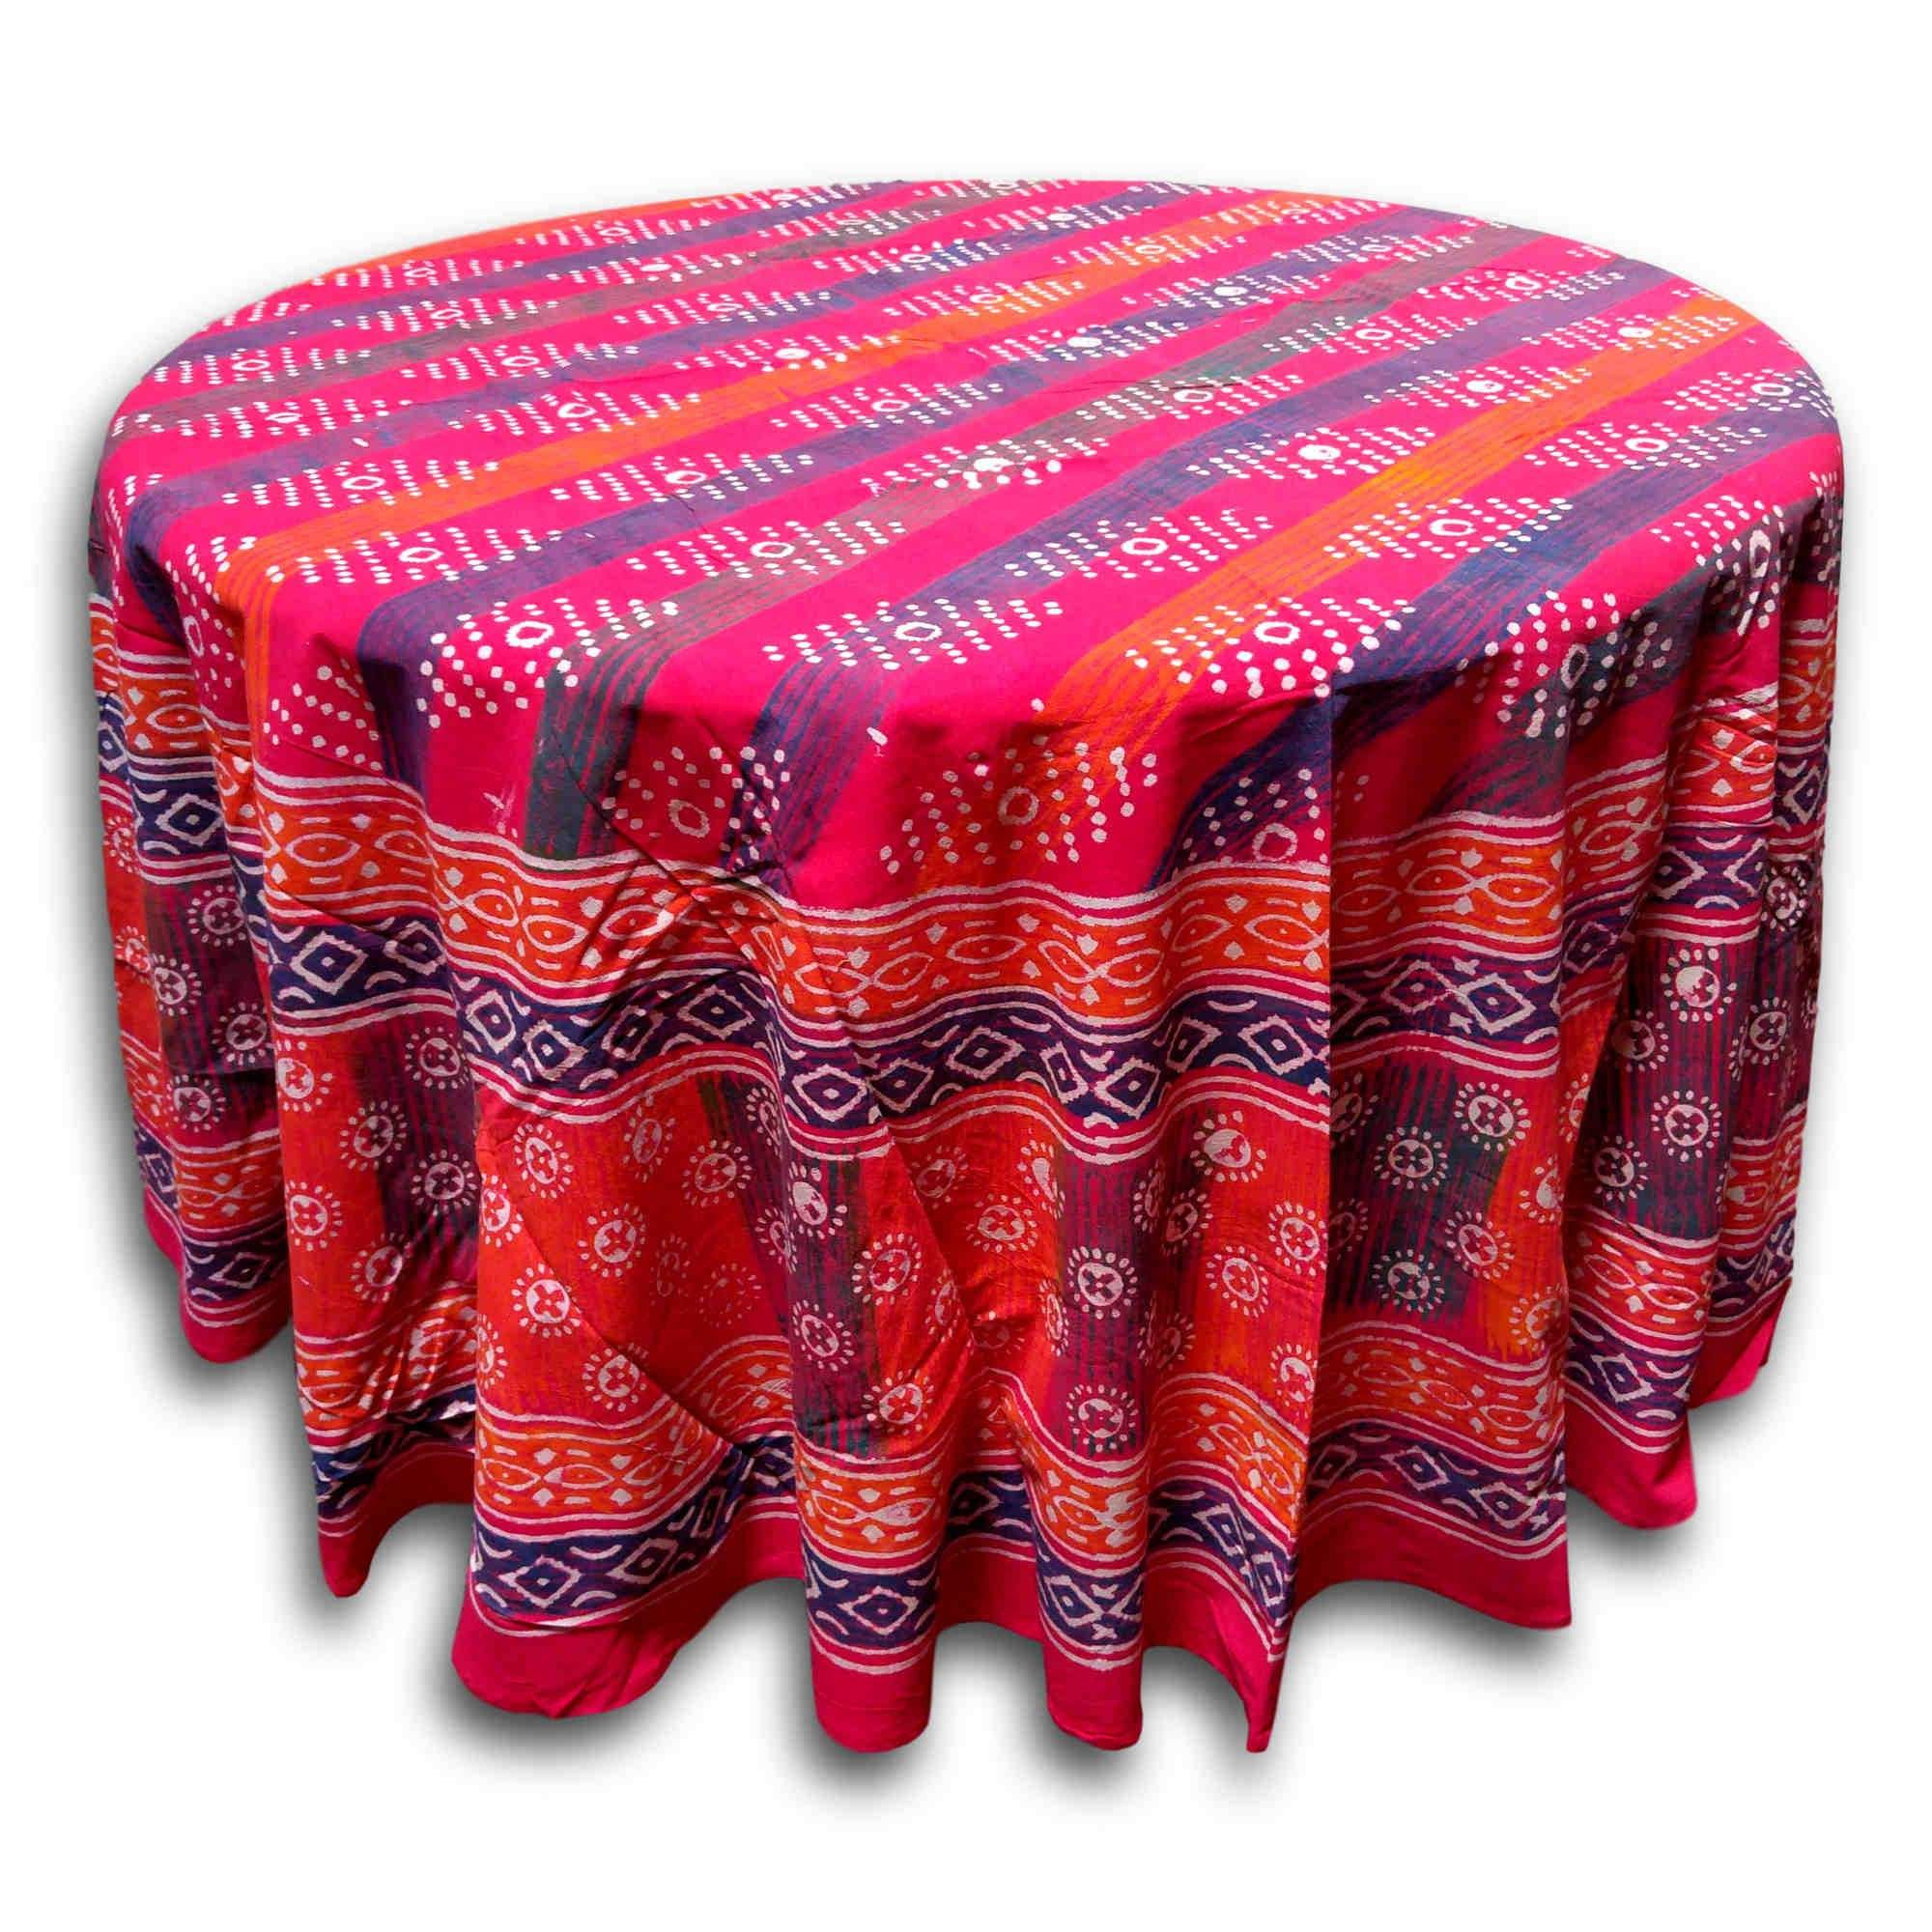 Handmade 100% Cotton Hand Block Print Dabu 90 Inches Round Tablecloth  Geometric Red Orange